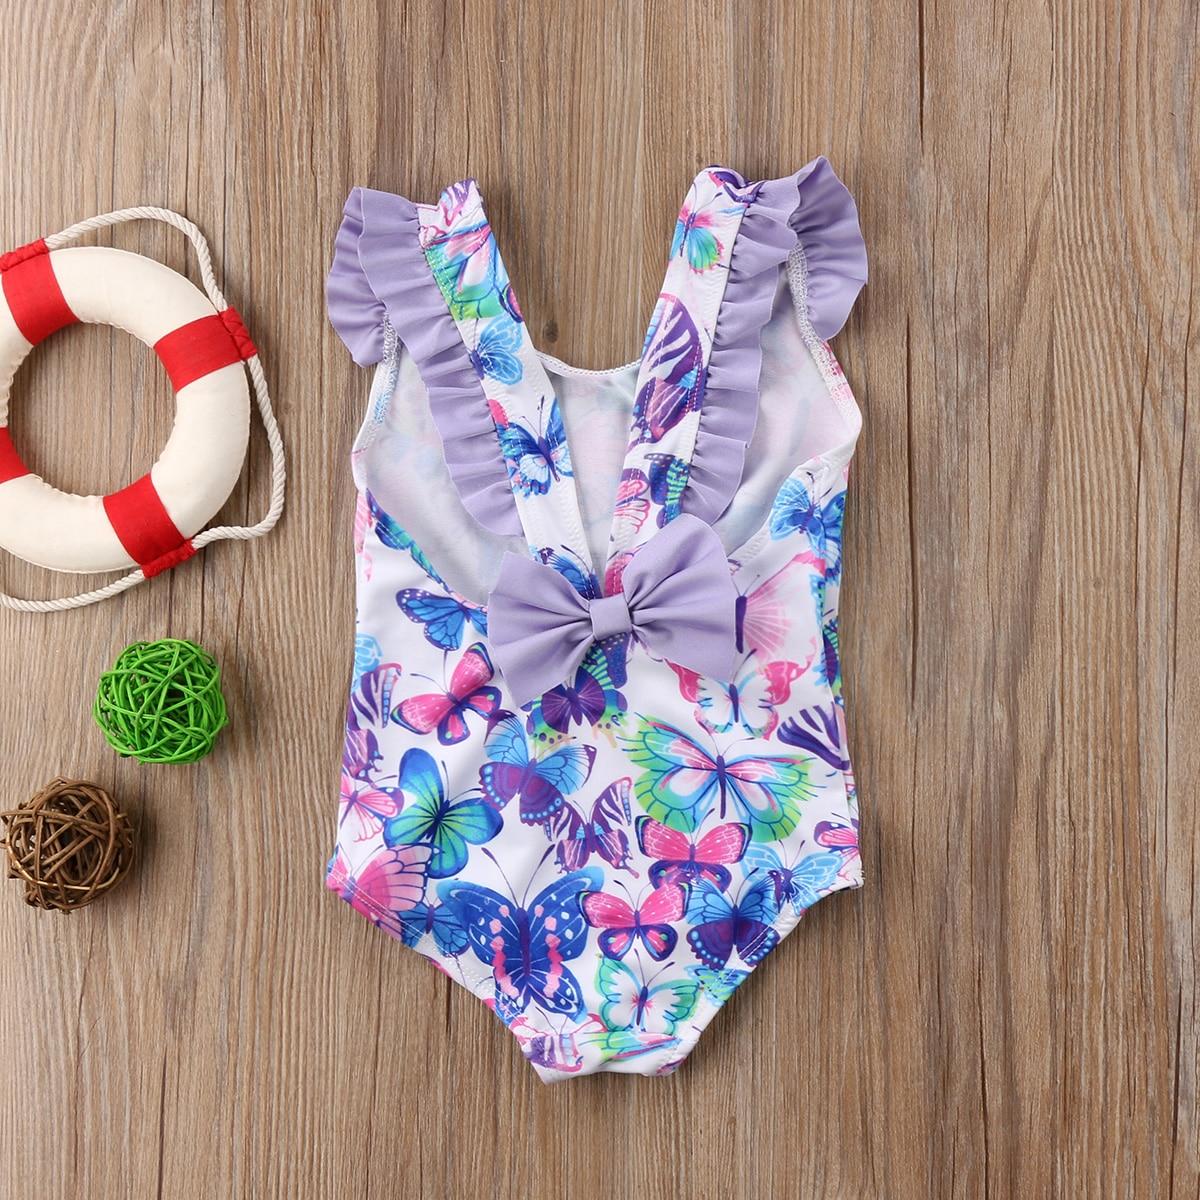 Butterfly Baby Girls Hot Bikini Swimwear Bow Kids One Piece Swimsuit Beachwear Bathing Suit in Children 39 s One Piece Suits from Sports amp Entertainment